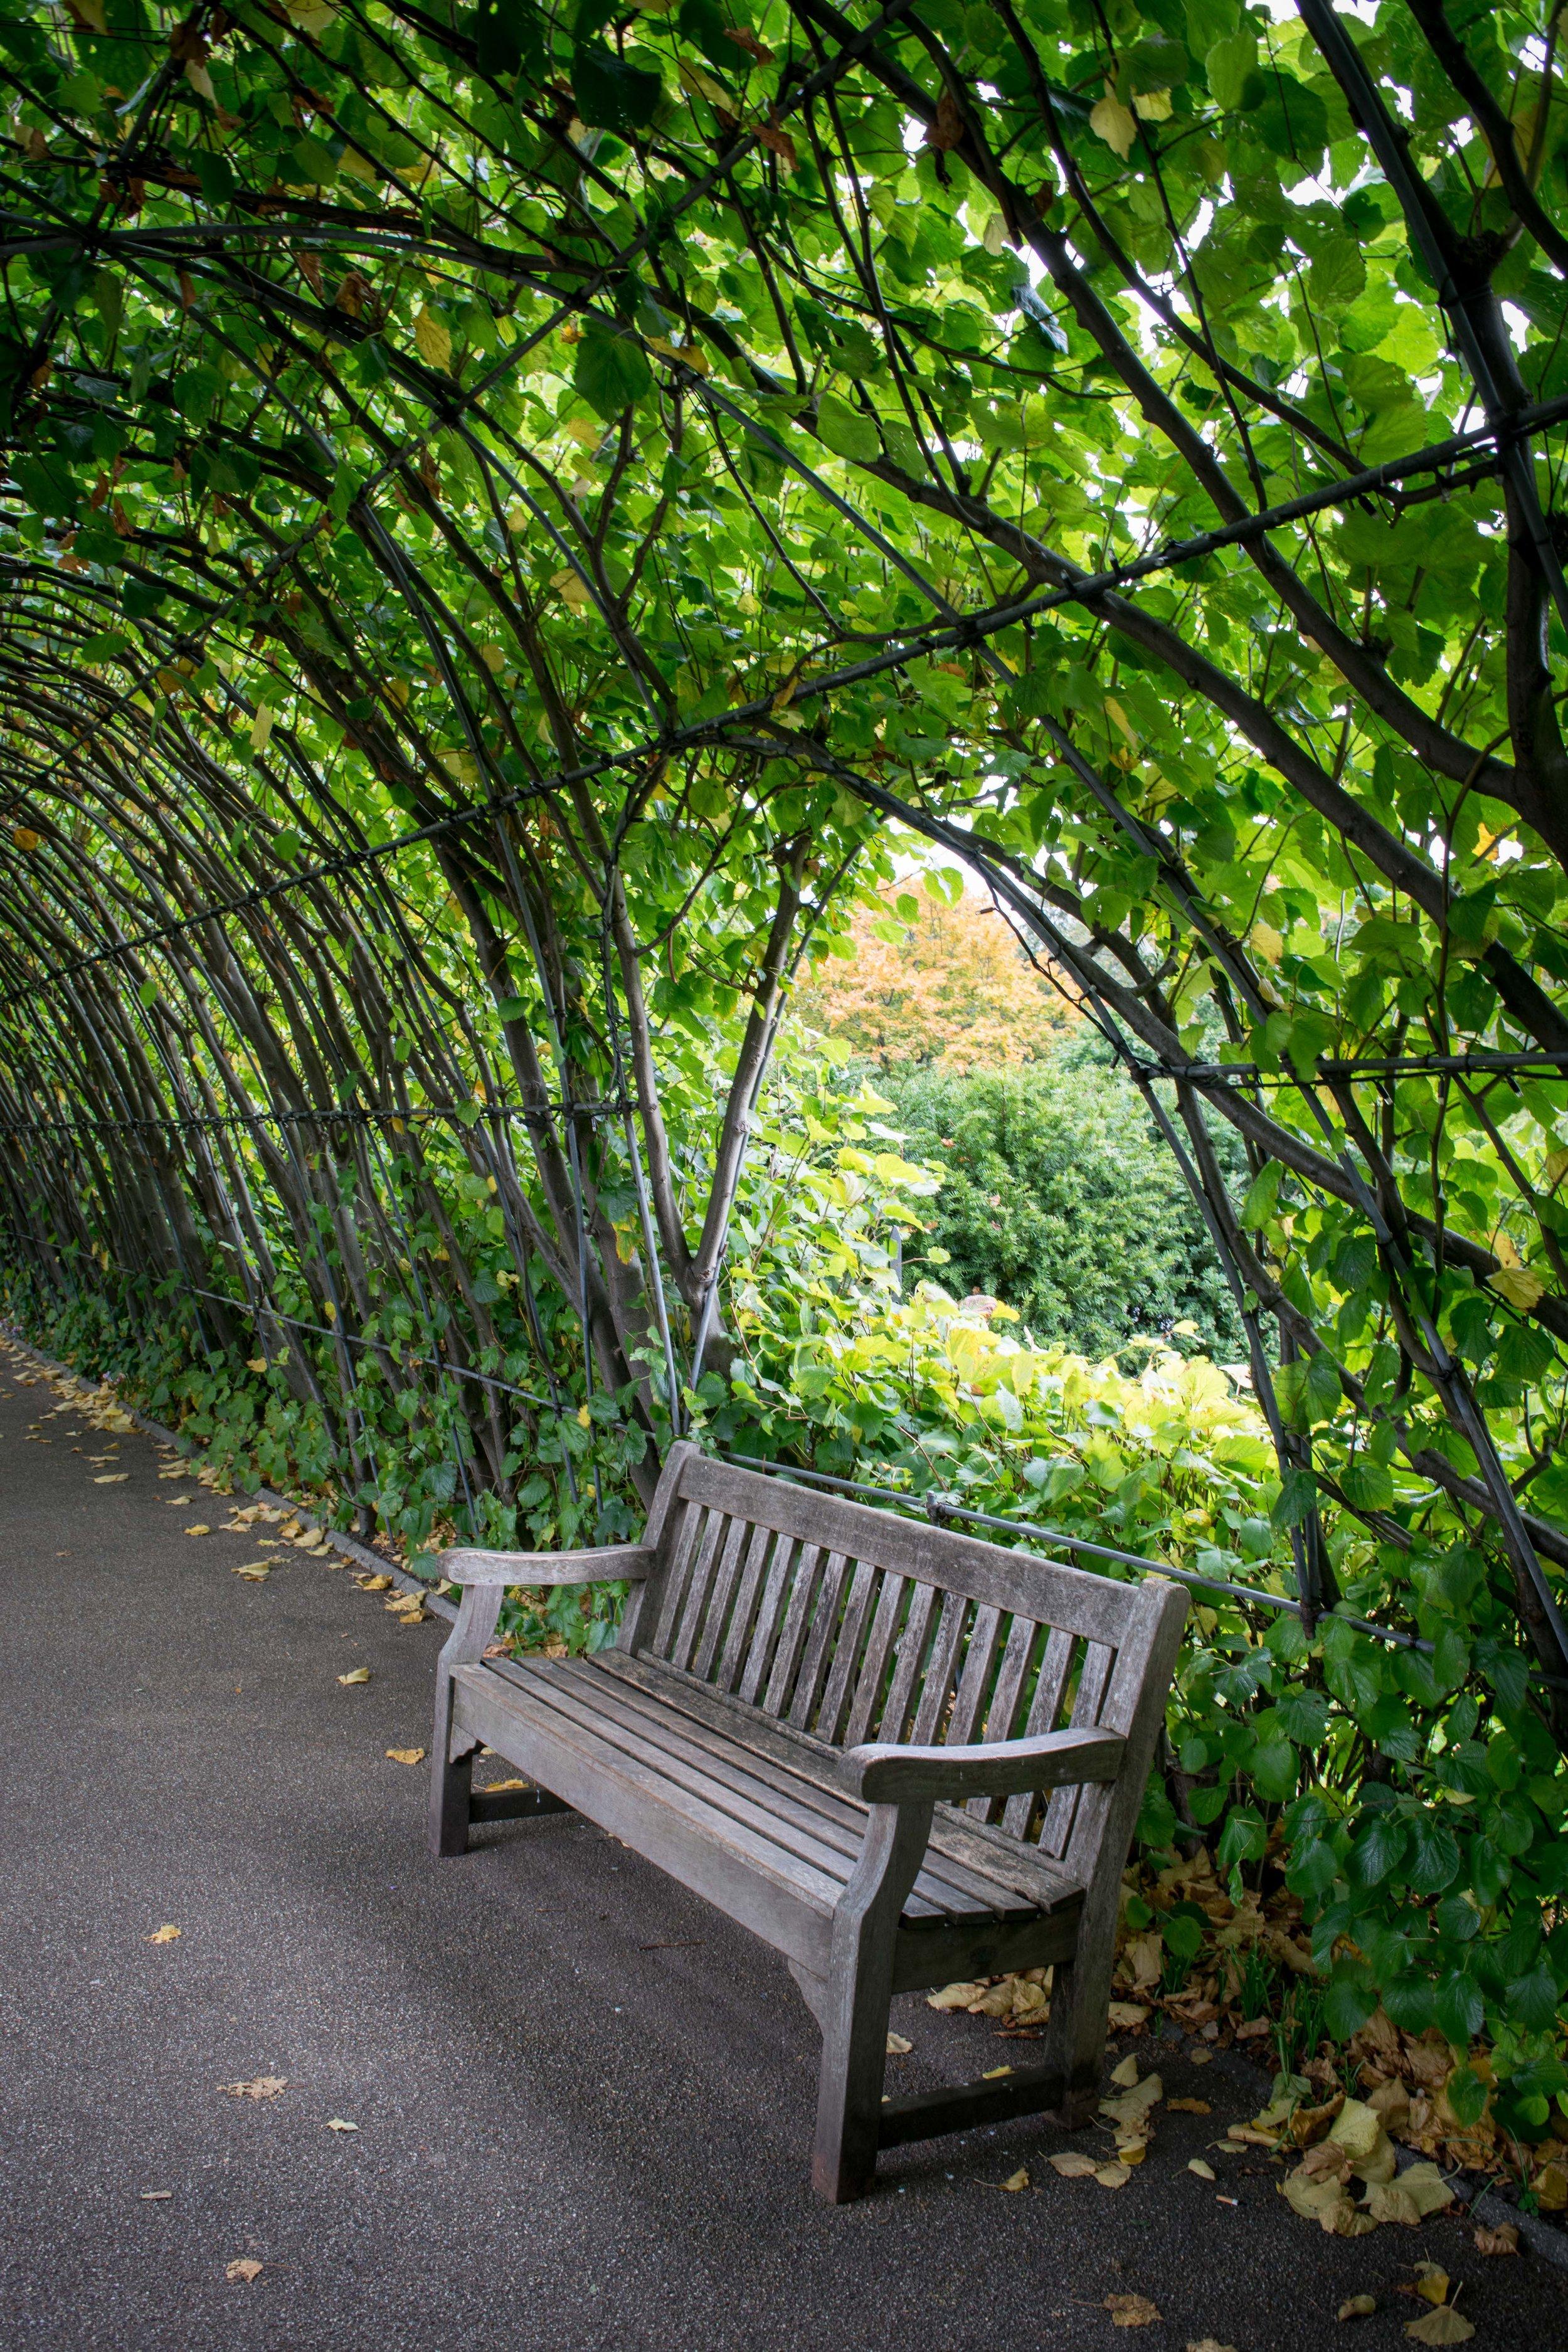 Bench in Kensington Gardens